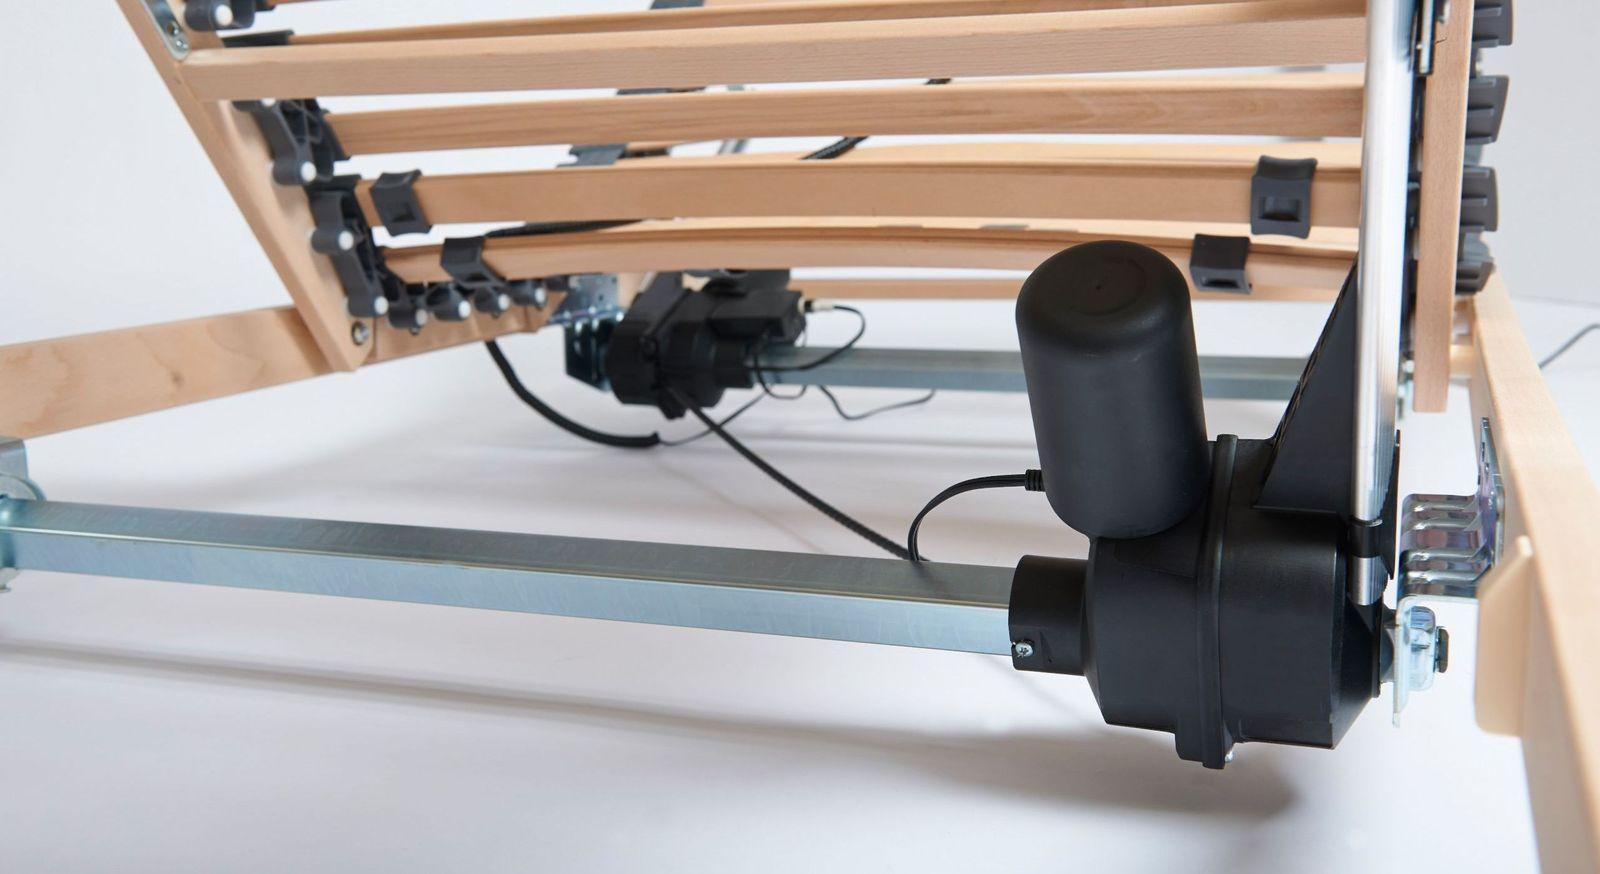 Lattenrost electroflex mit leisem Motor